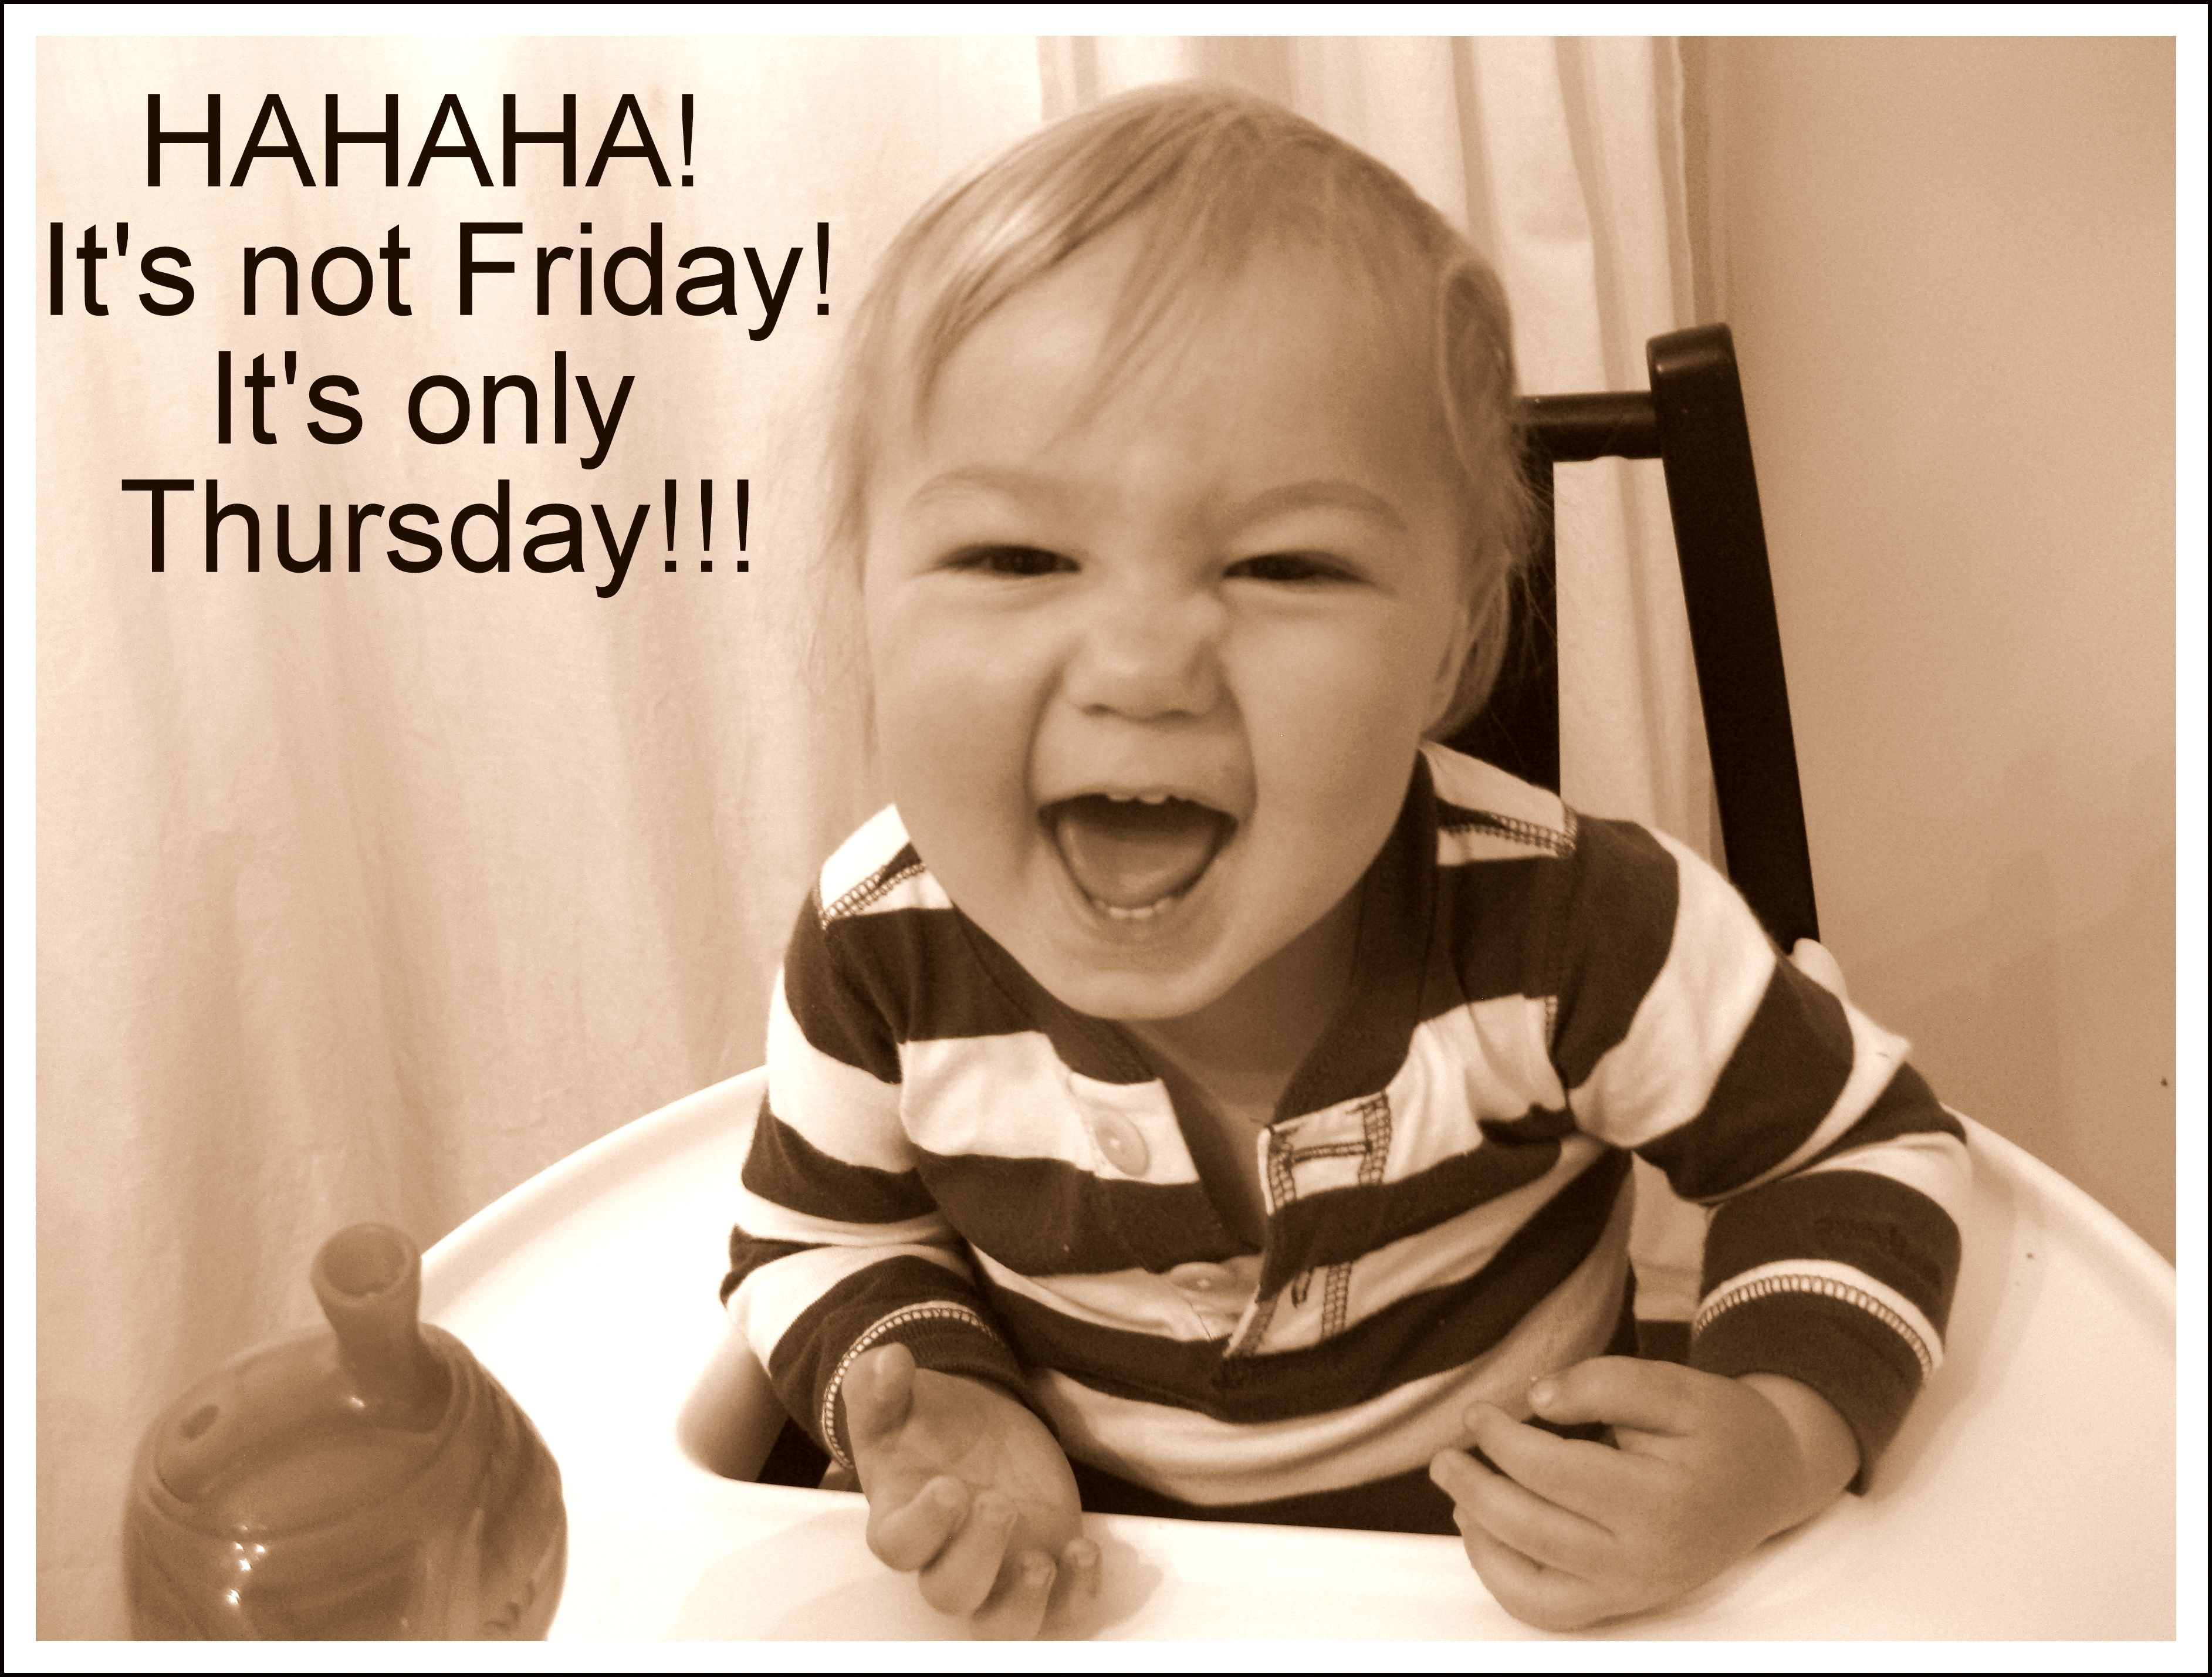 It's only Thursday!!! Ughhhh Good Morning funny